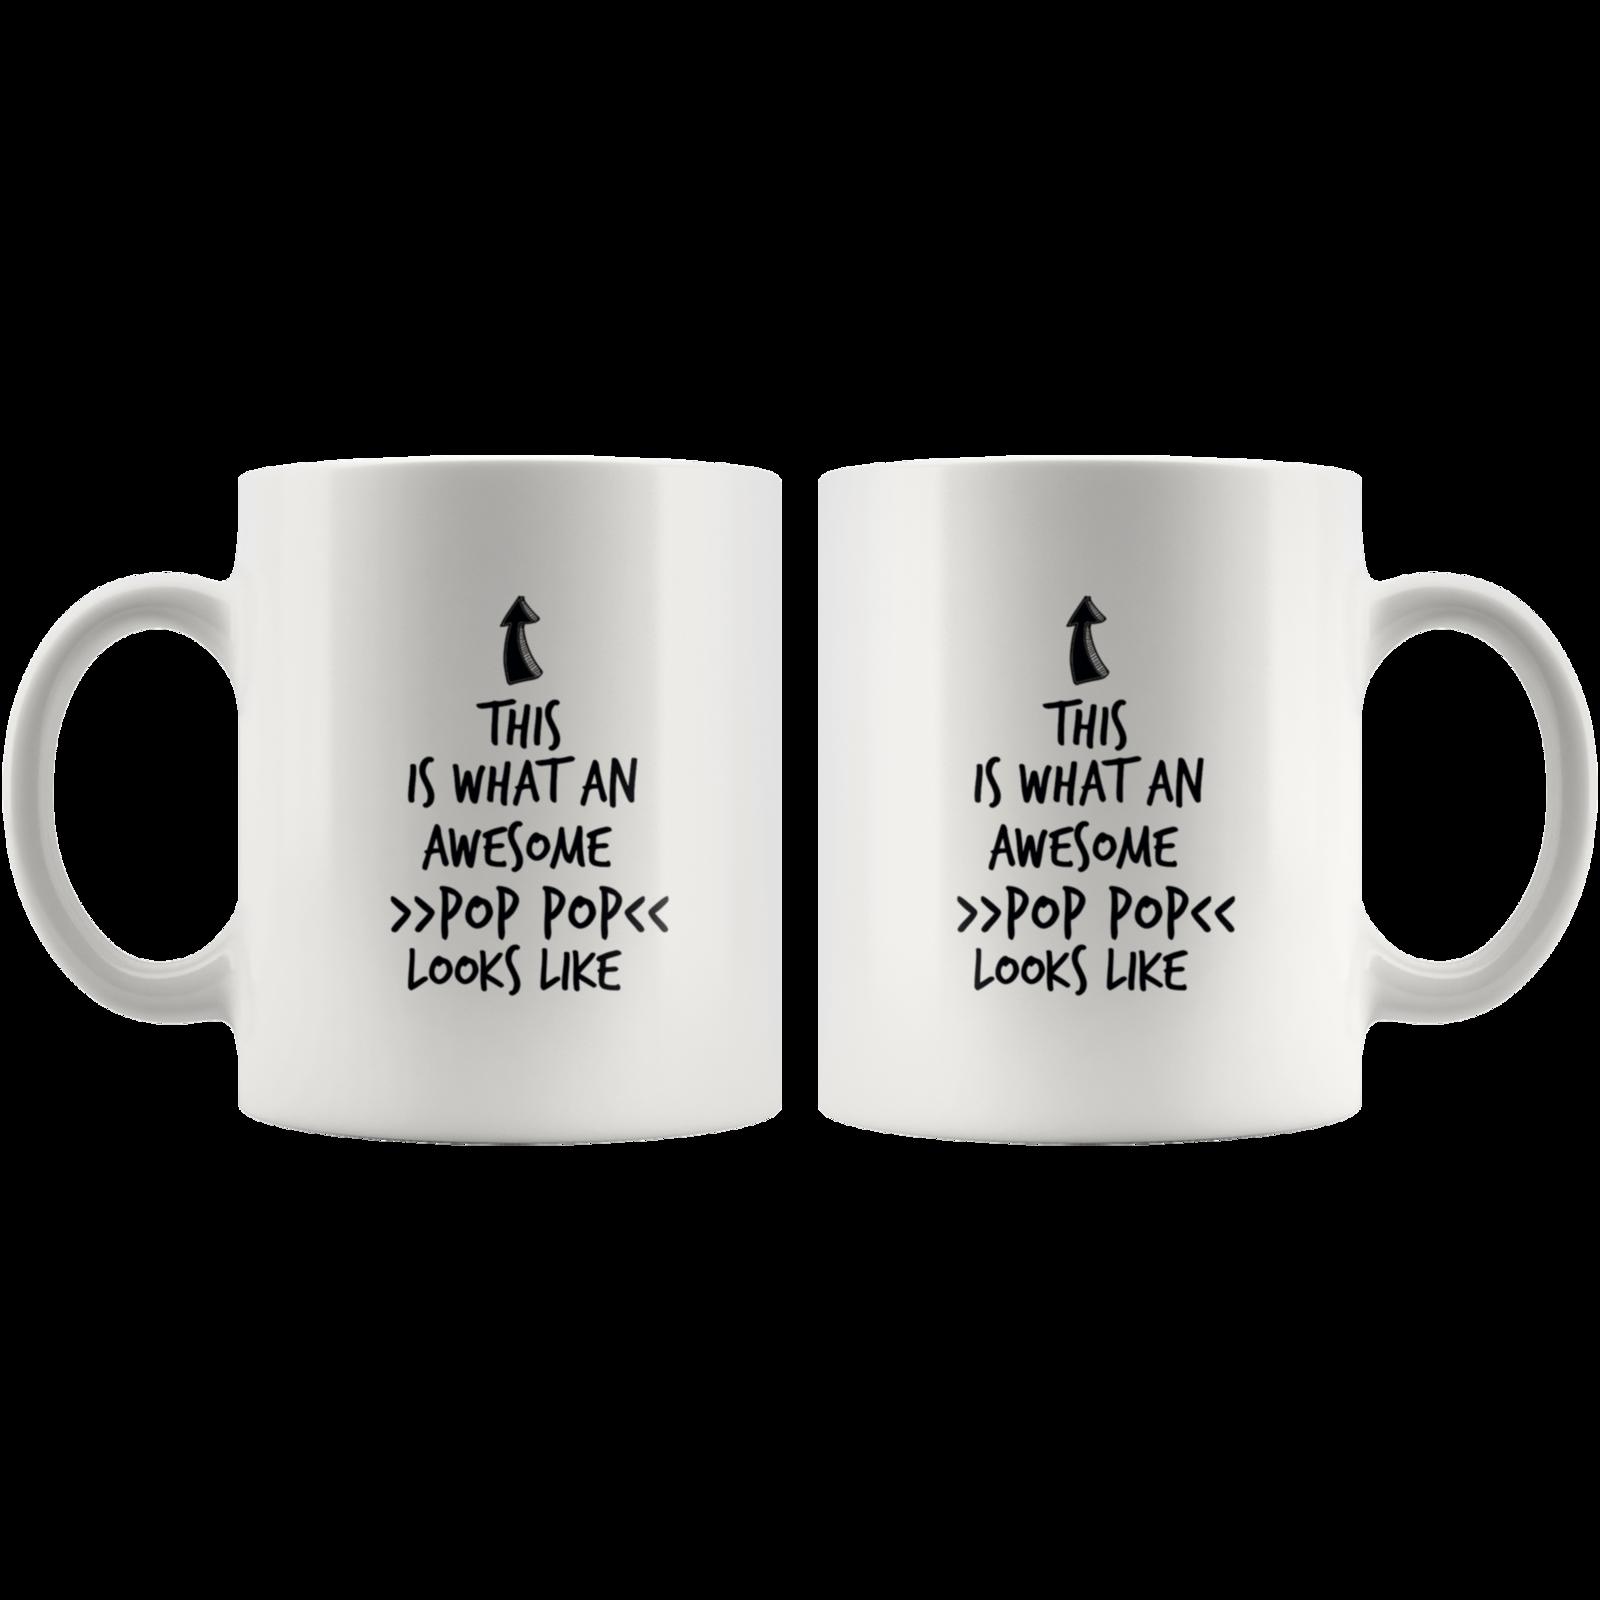 Coffee mug gift What an awesome POP POP mug